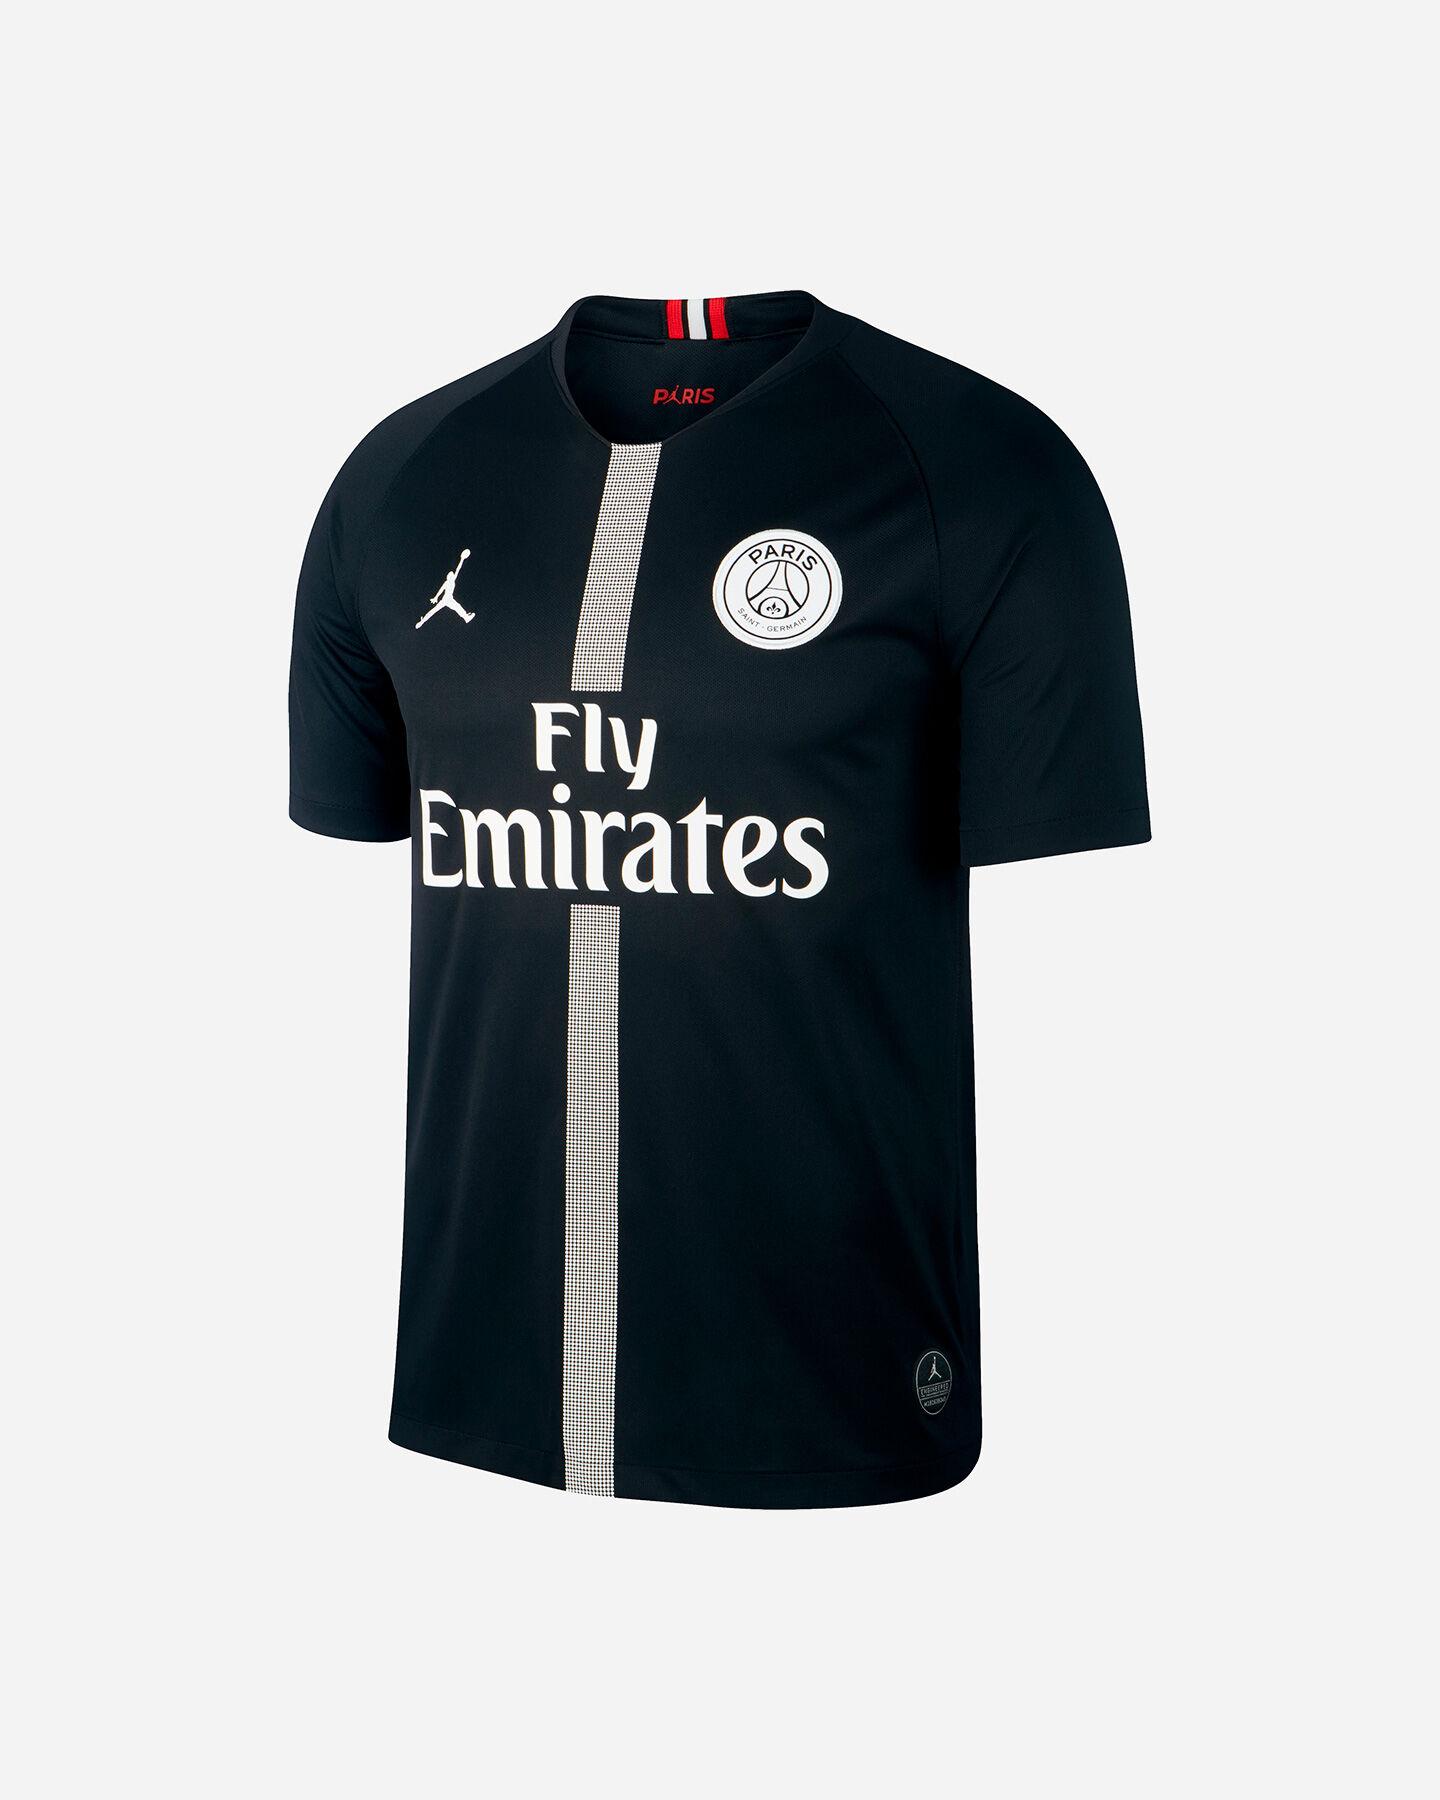 Maglia Calcio Nike Paris Saint-germain Third 18-19 M 919010-012 ...